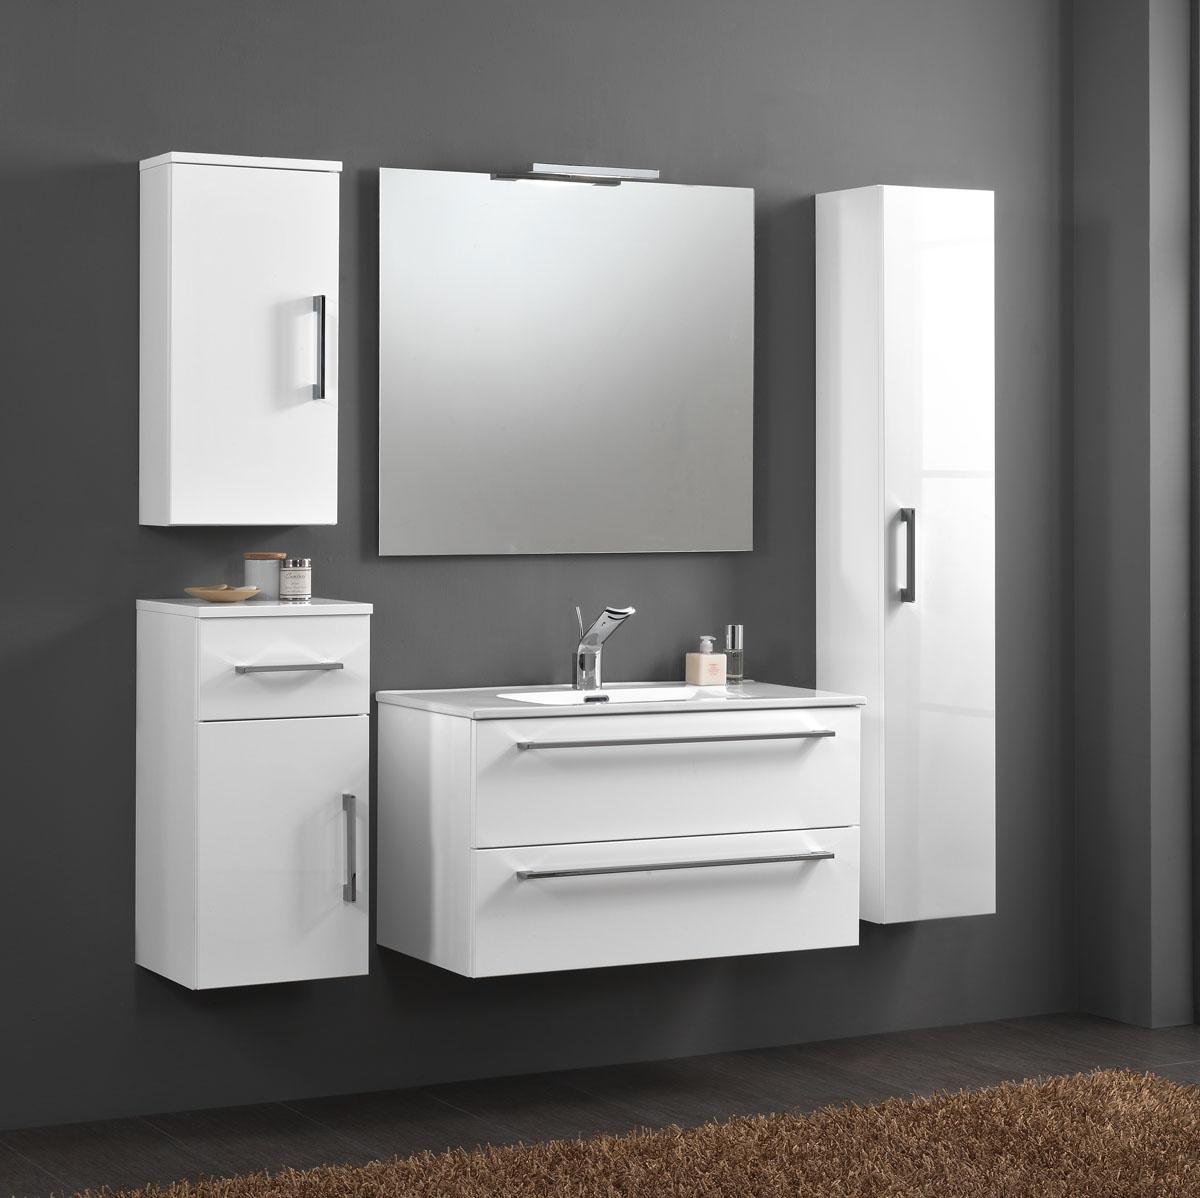 Picture of: Maranello 13 Washbasin Unit B M Supplies Ltd